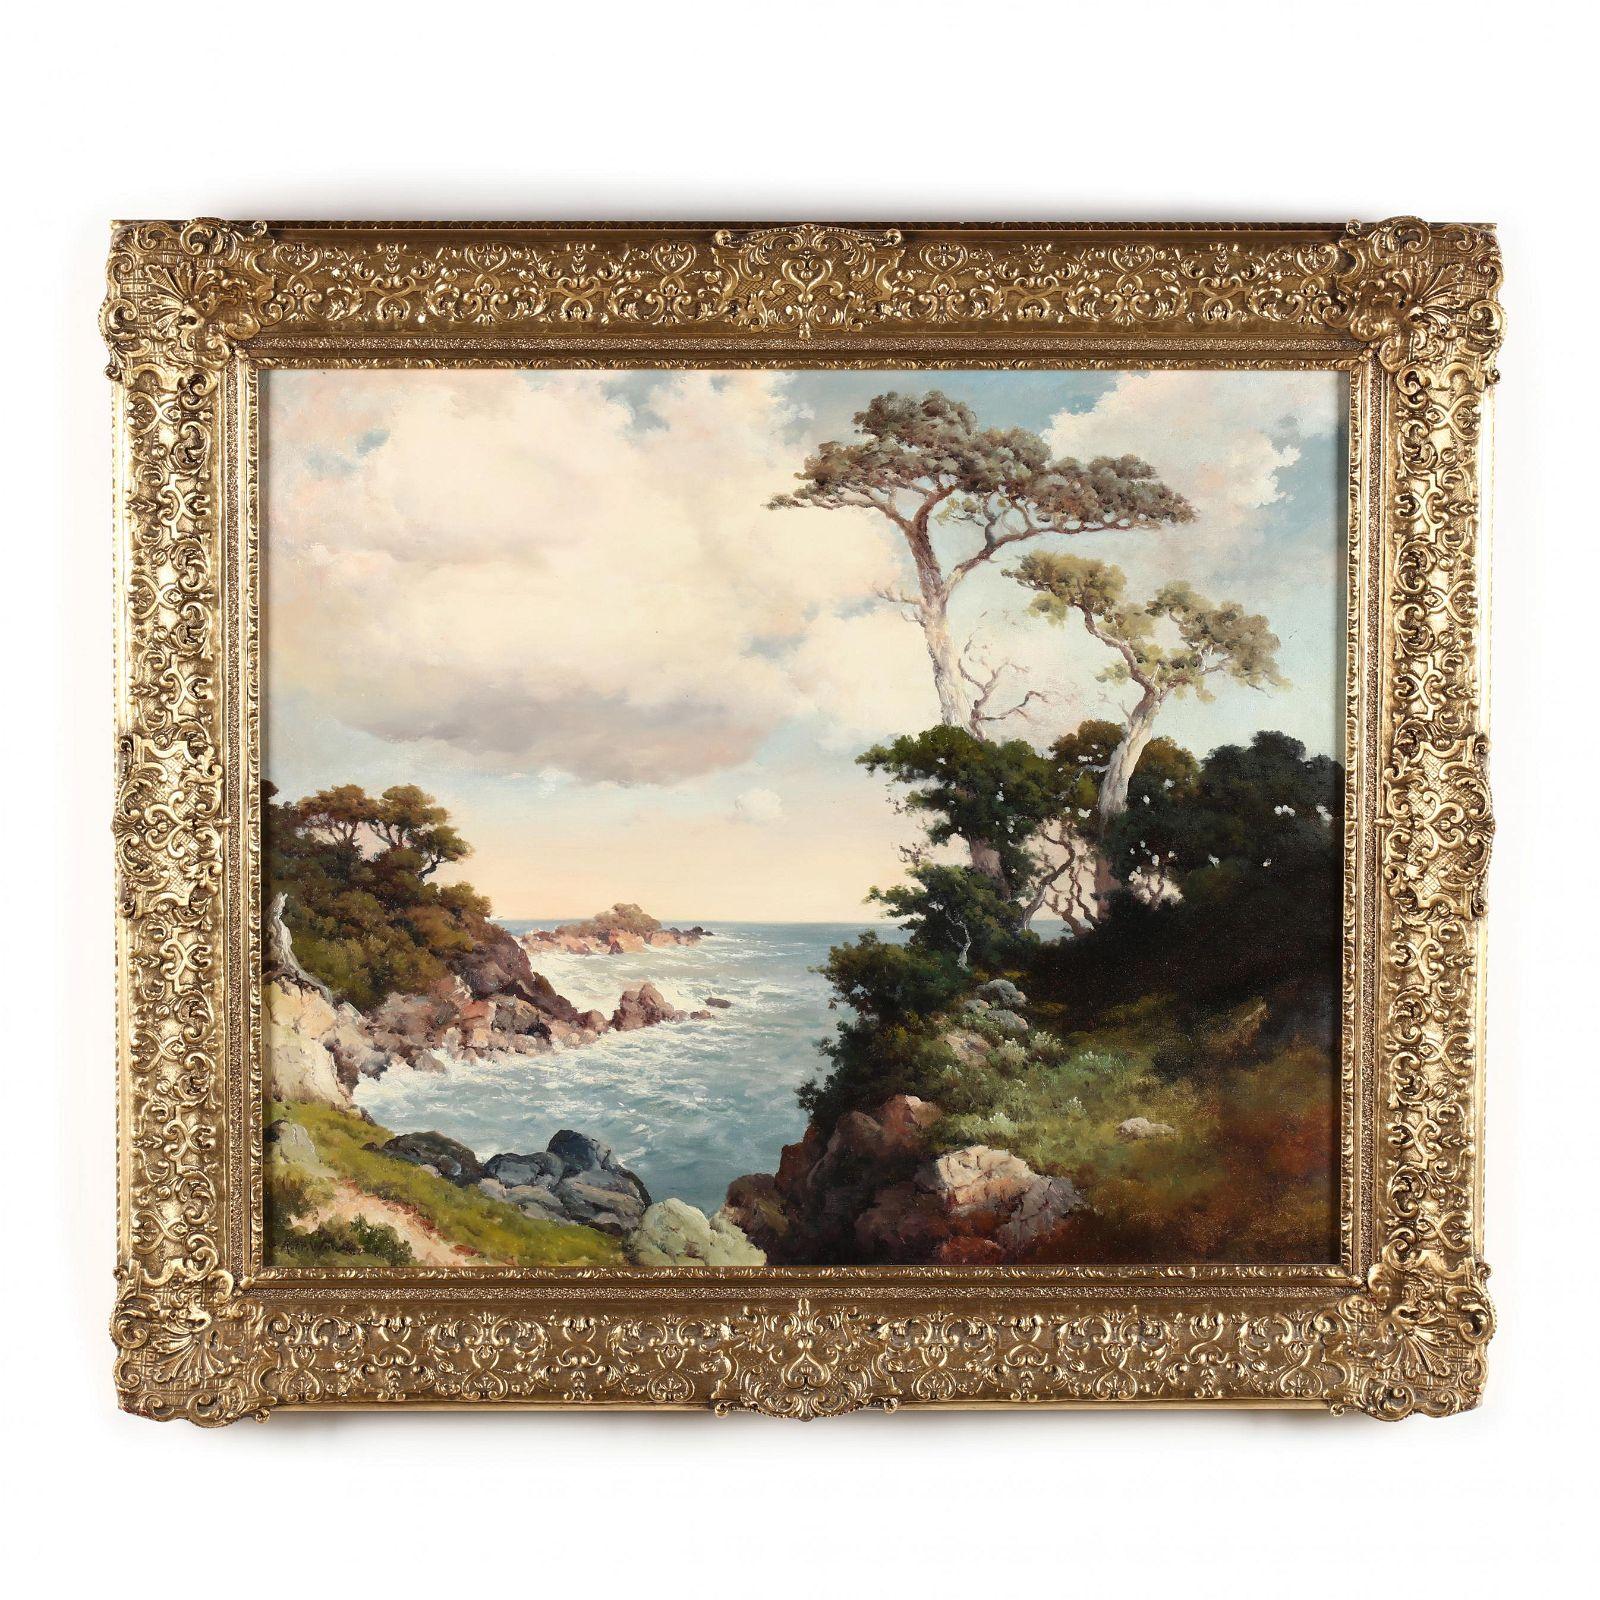 Robert William Wood (American, 1889-1979), Monterey